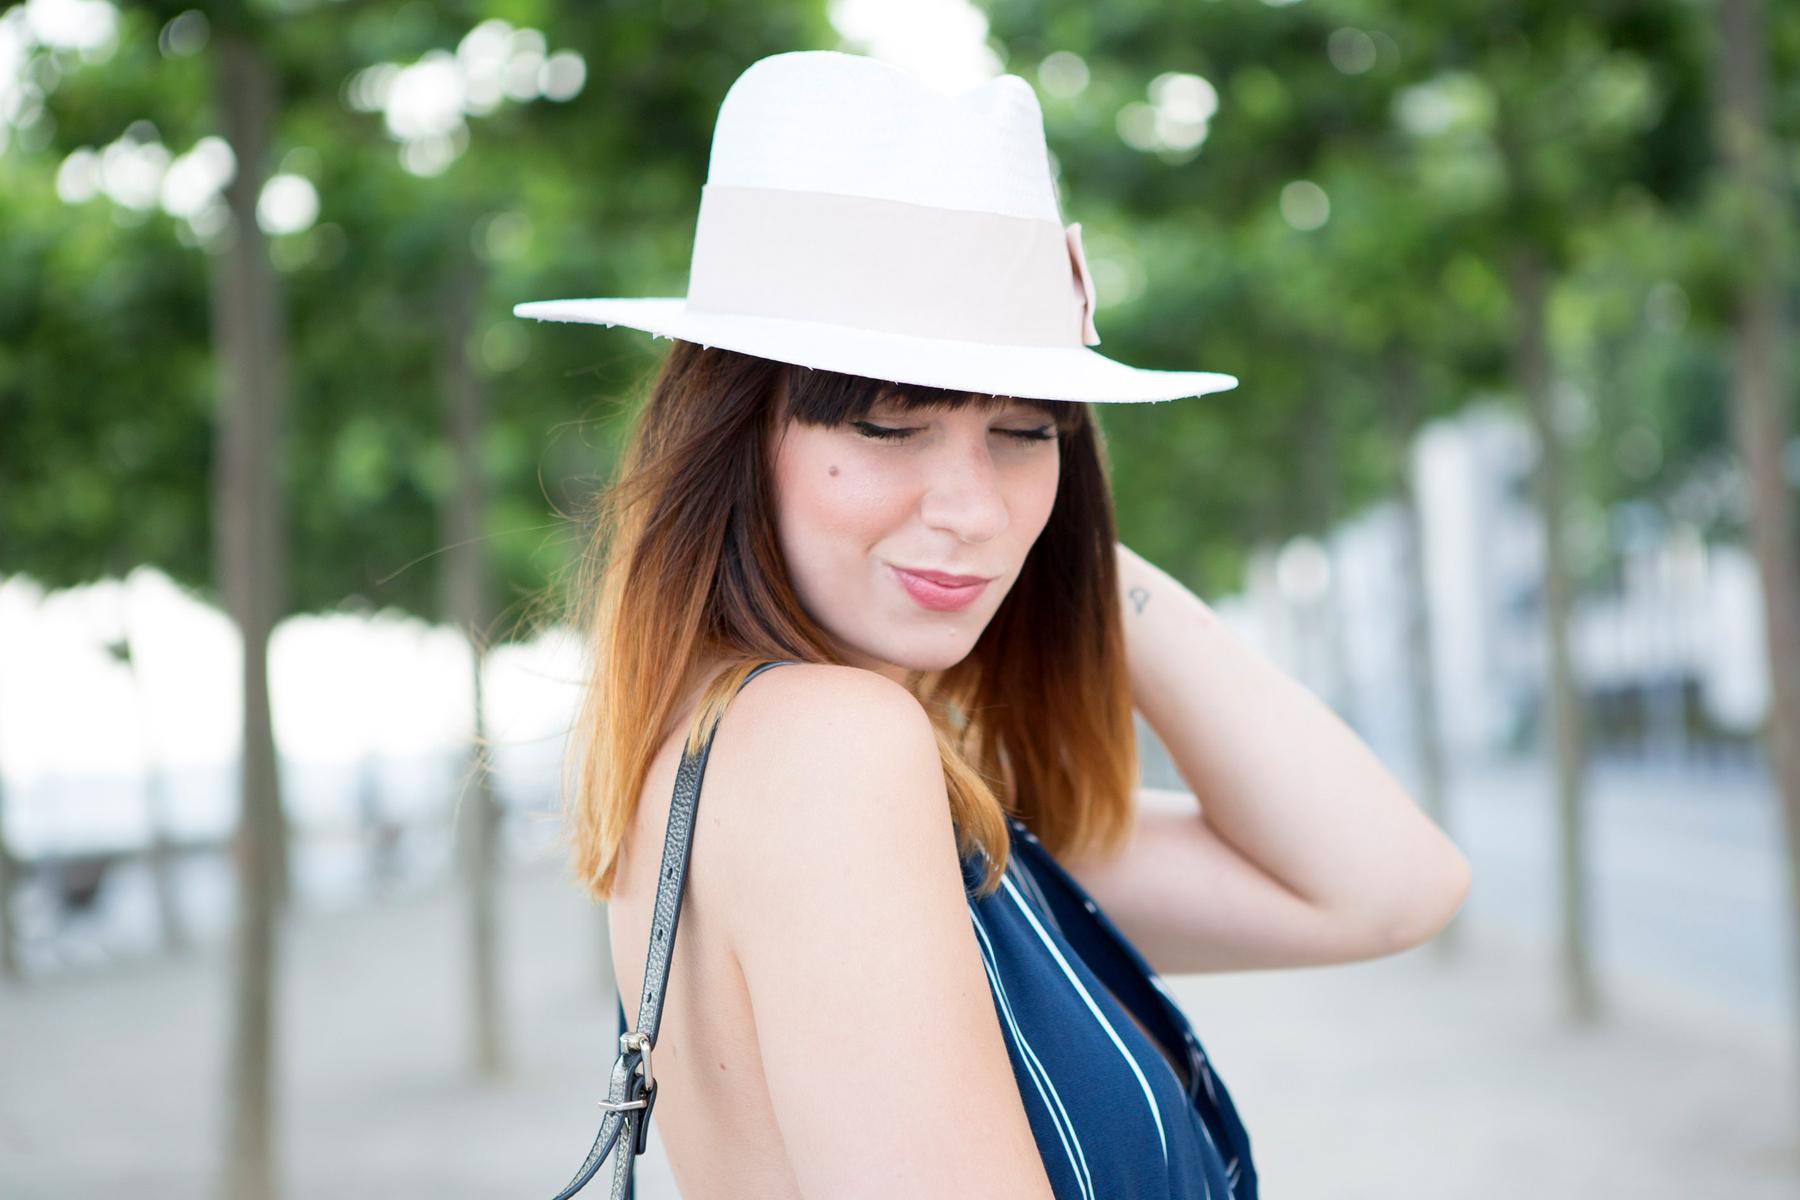 forever 21 jumpsuit overall streifen blue hat summer ombre cats & dogs ricarda schernus blogger berlin 4